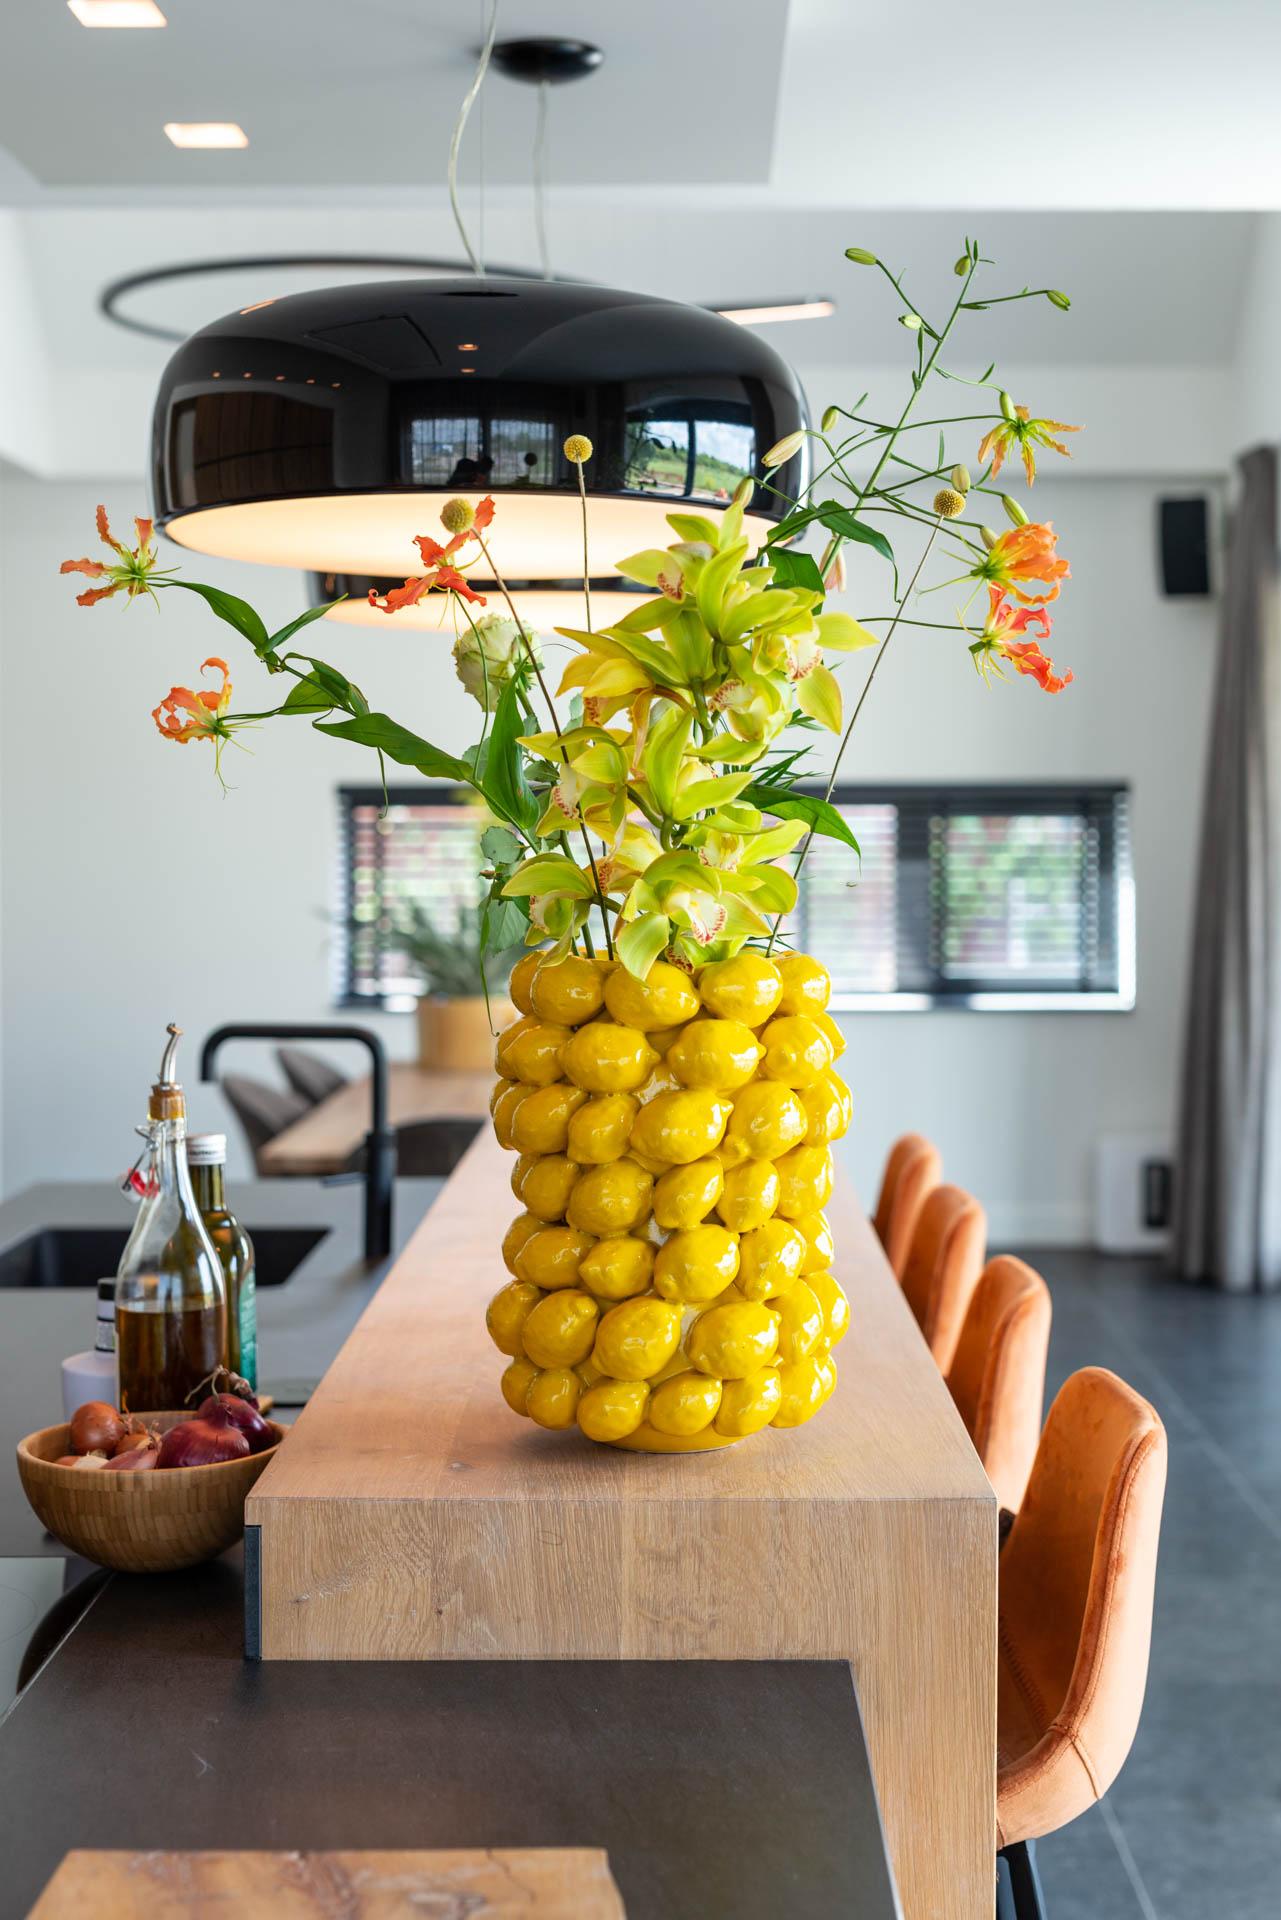 Moderne eikenhouten keuken met Miele apparatuur